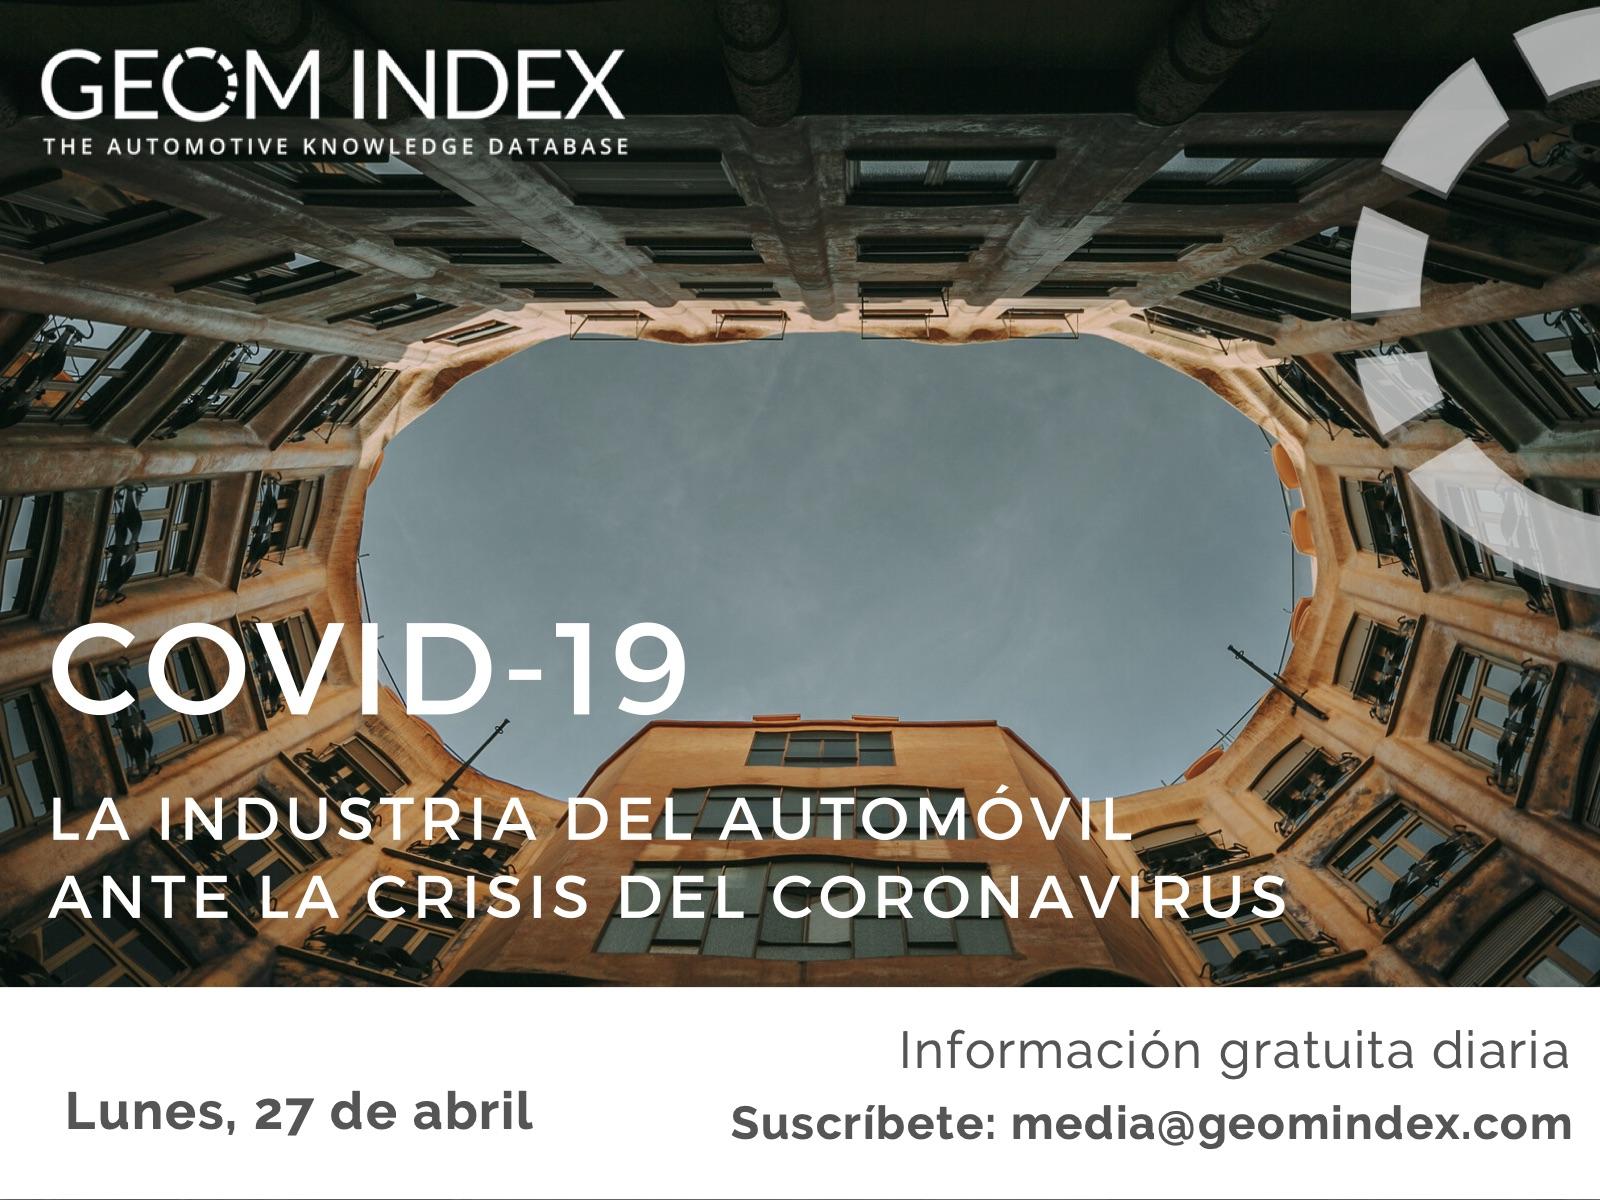 Informe 27 de abril – La industria del automóvil ante la crisis del Covid-19